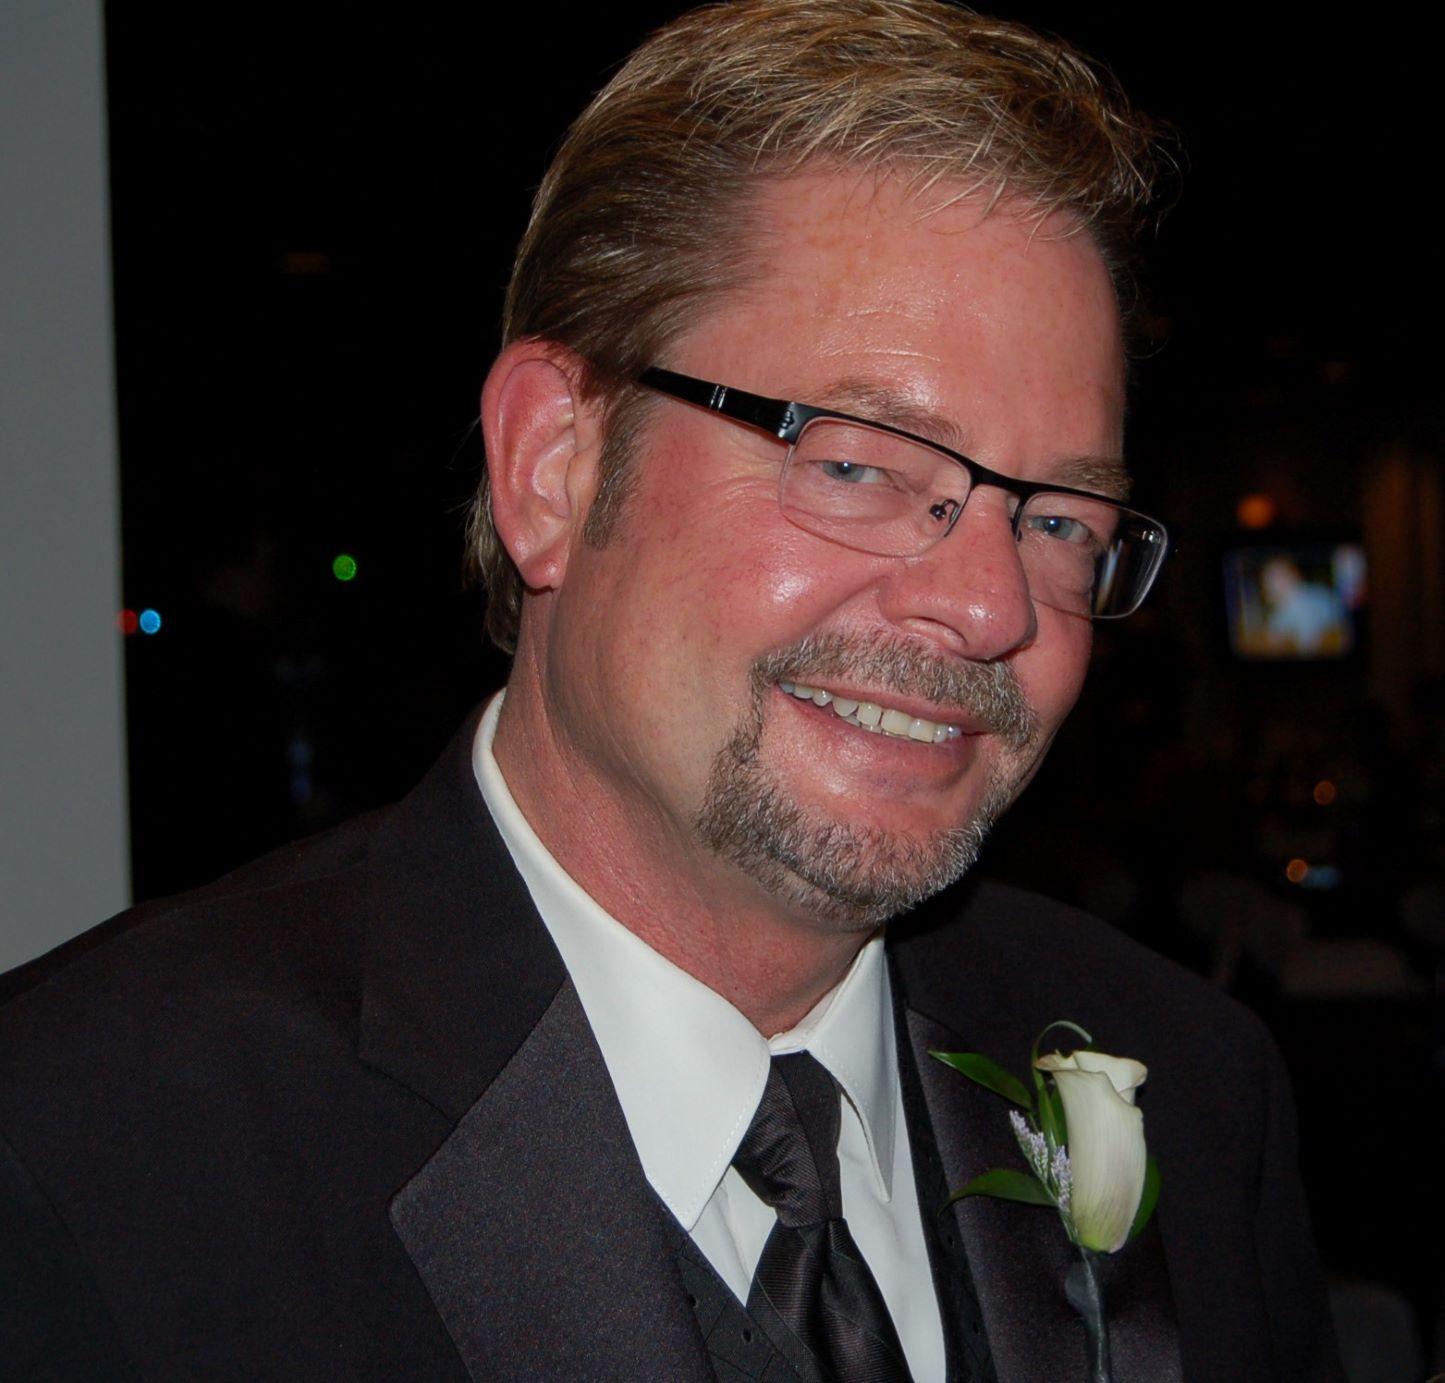 David L. Holmgren